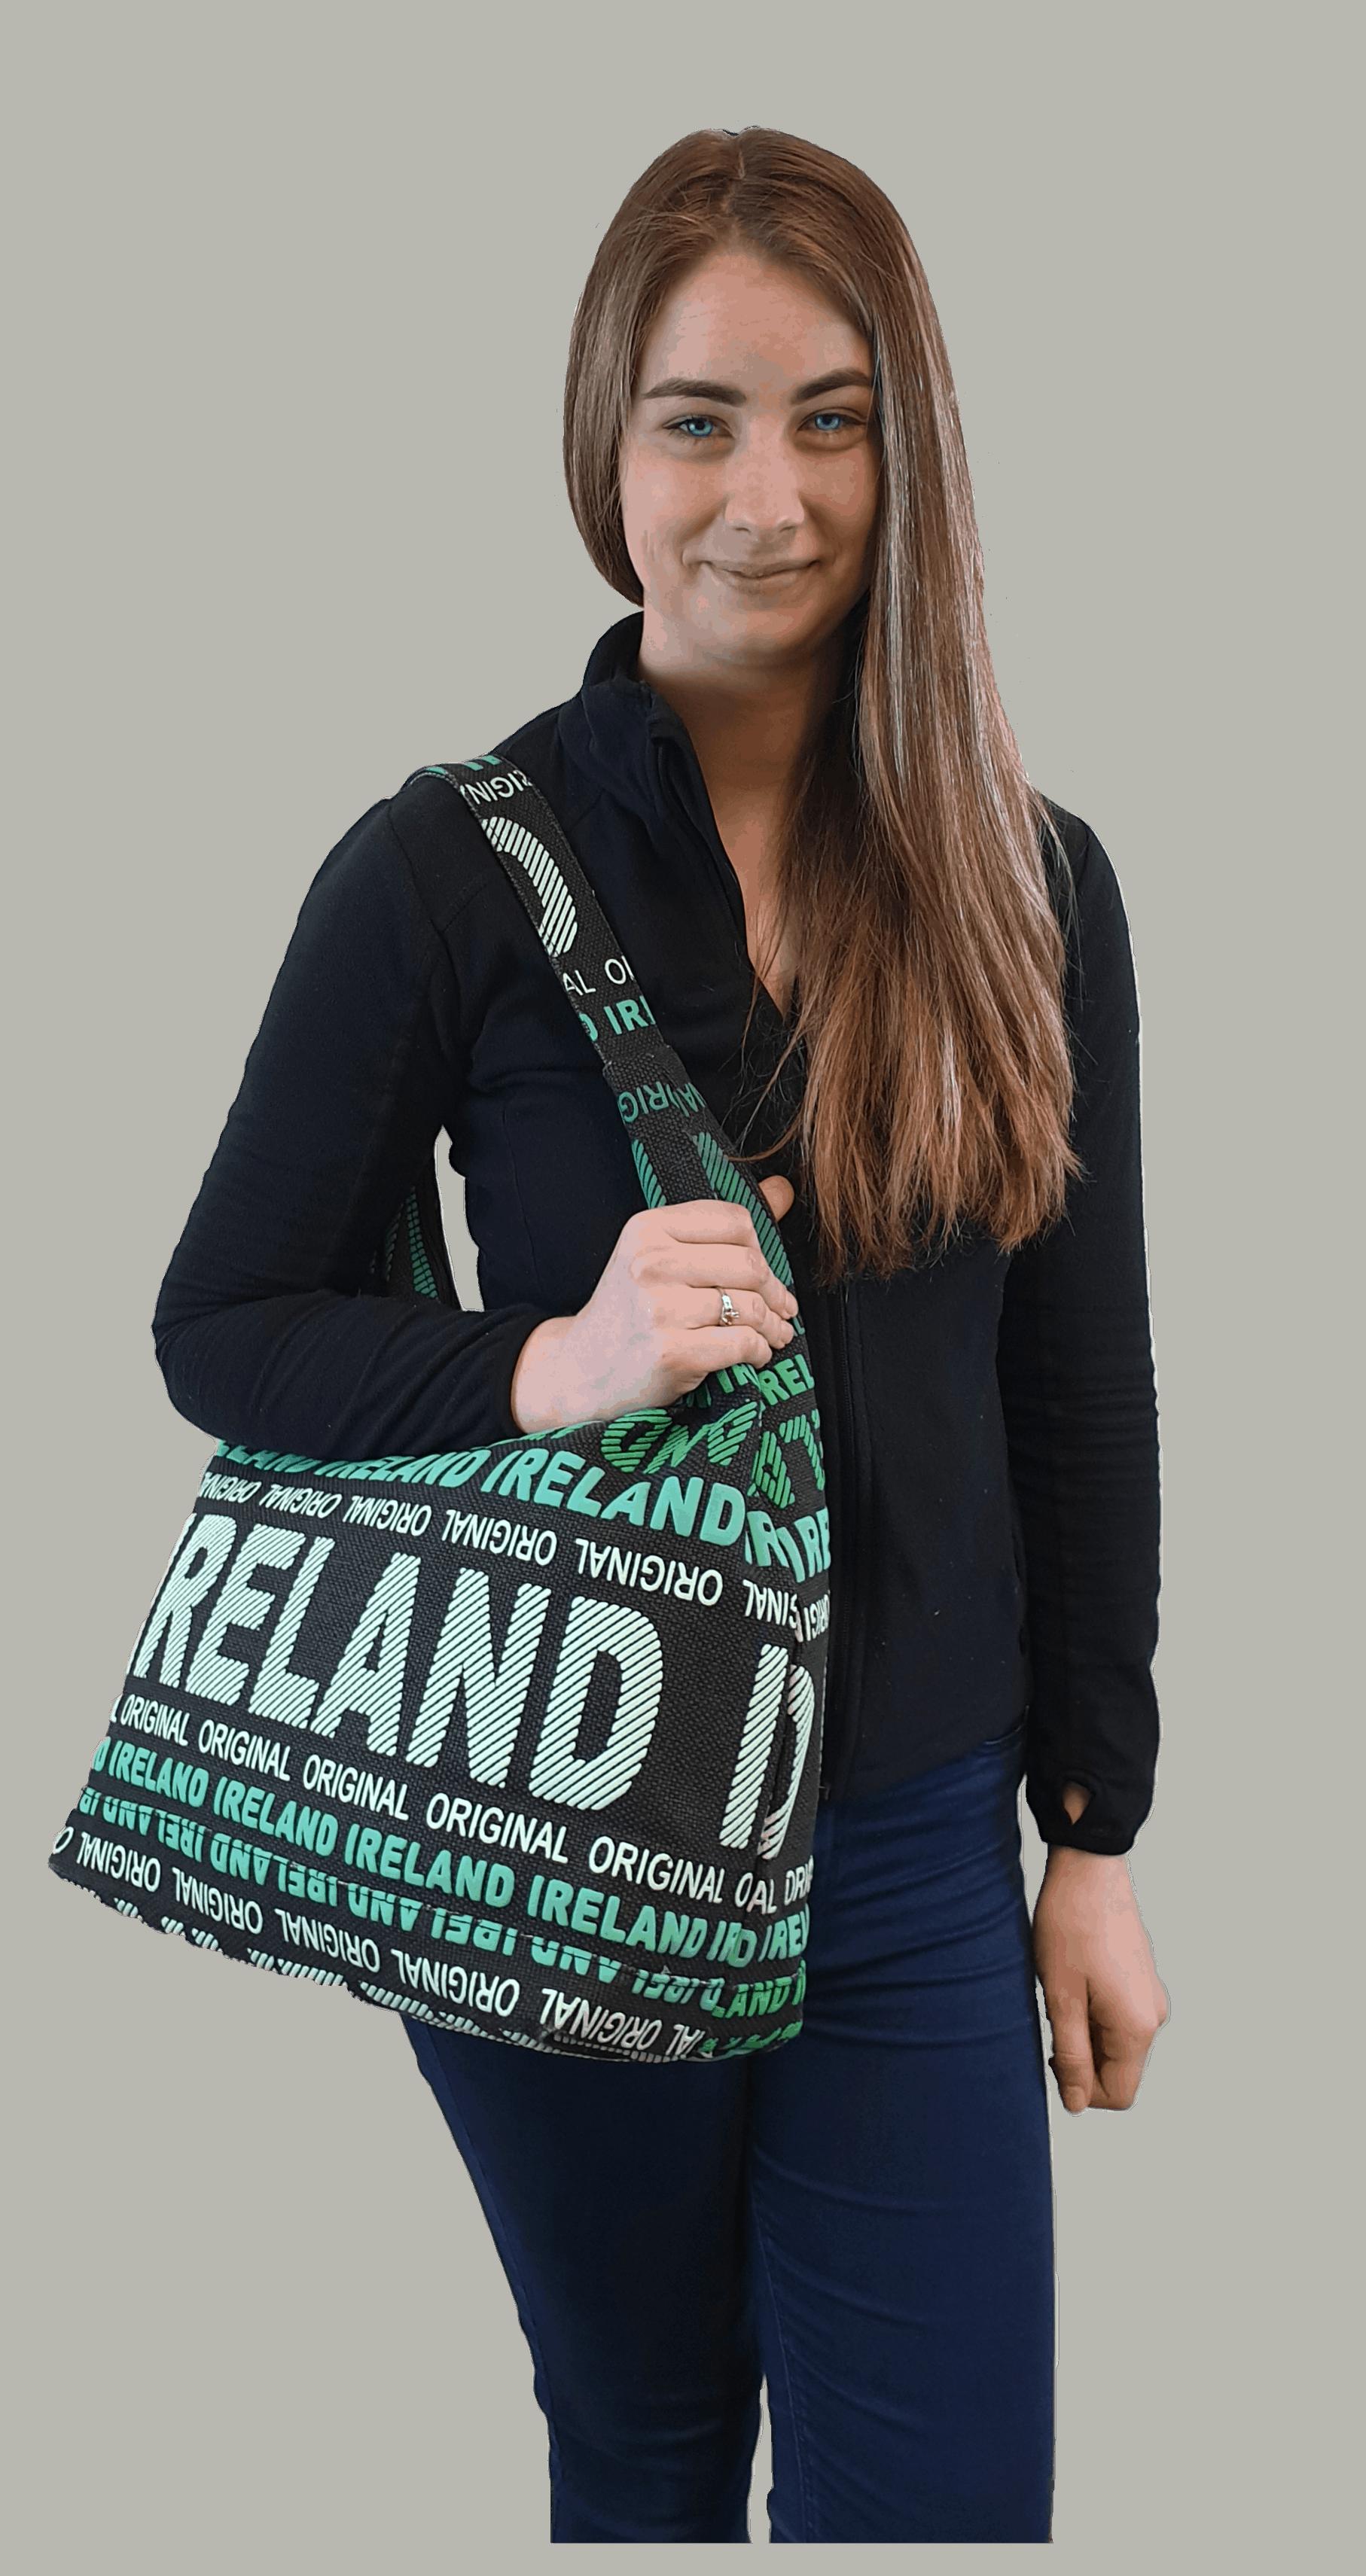 Canavas bag with Ireland logo worn over the shoulder